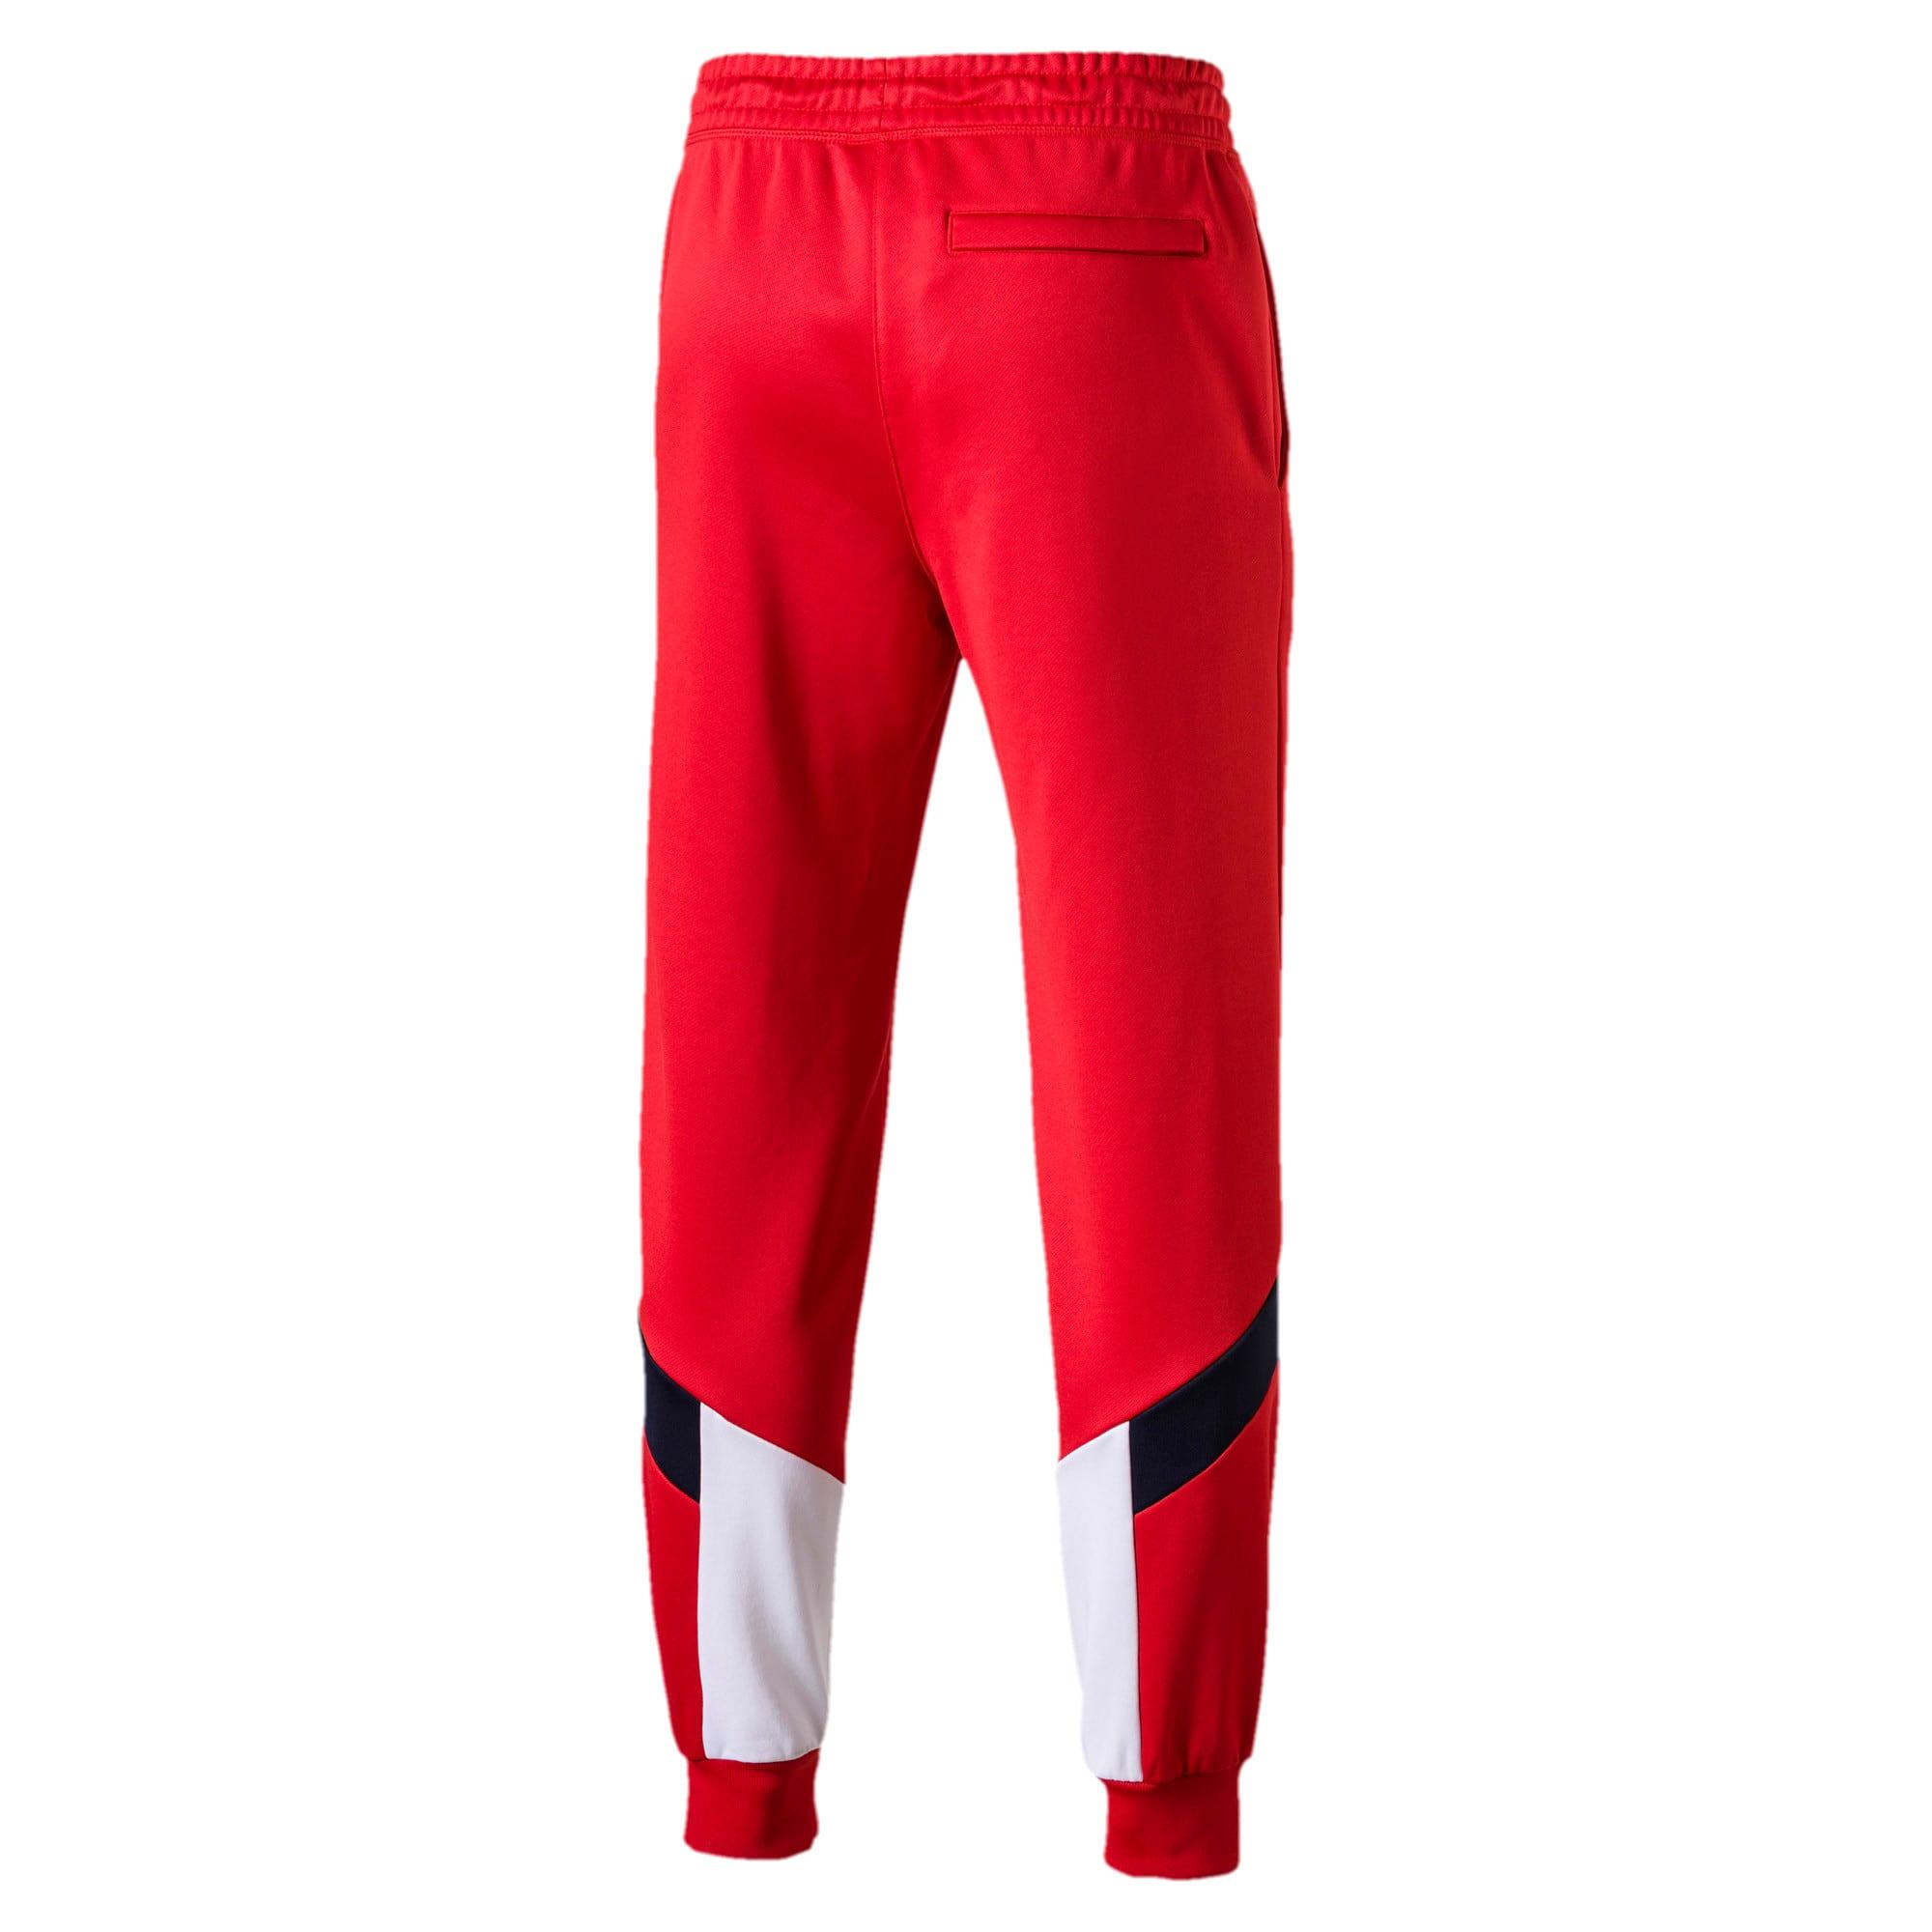 Thumbnail 4 of Iconic MCS Men's Track Pants, High Risk Red, medium